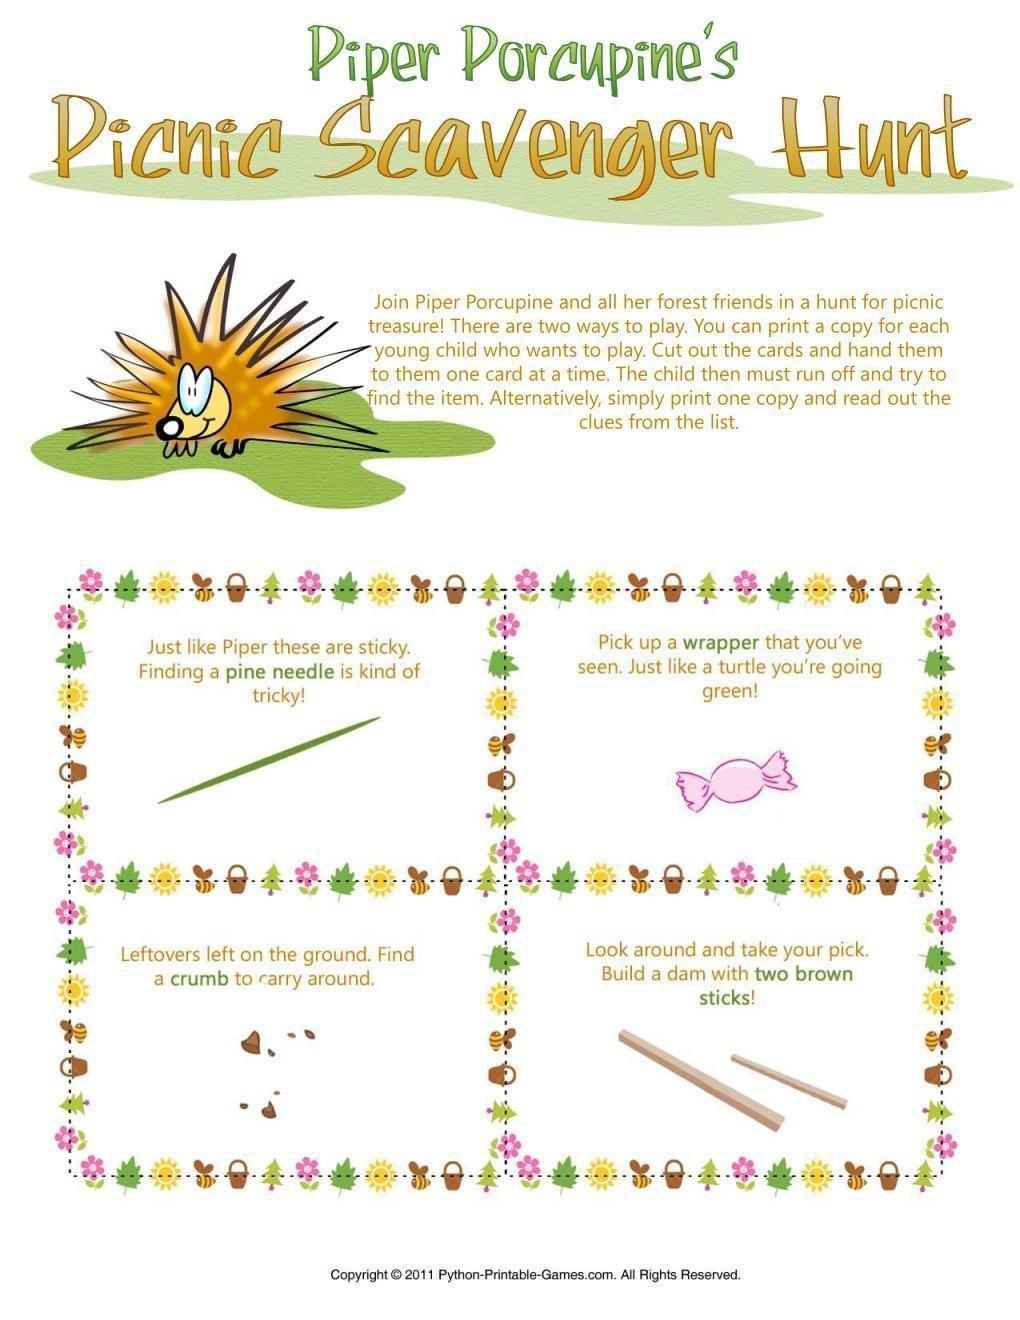 Picnic Games: Piper Porcupine's Scavenger Hunt